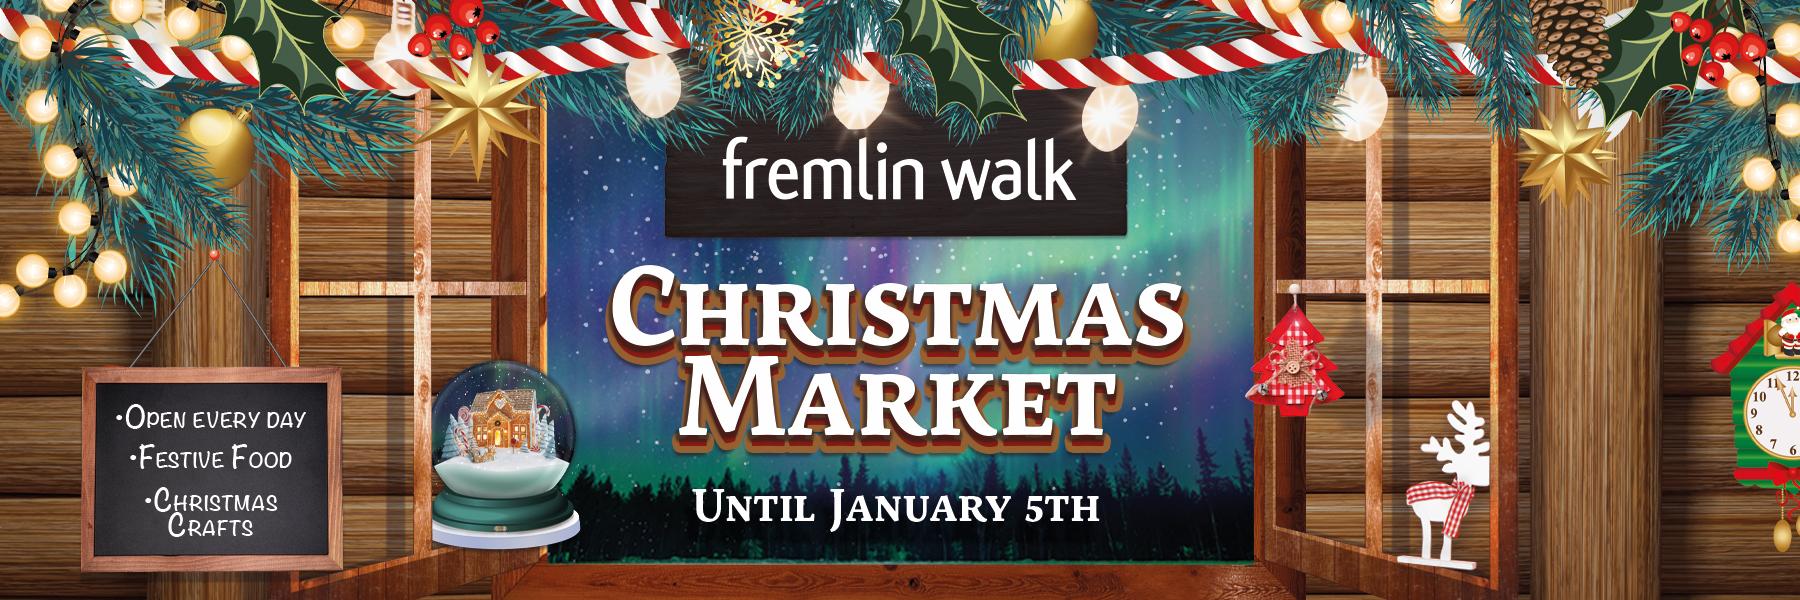 Fremlin Walk's Traditional Christmas Market